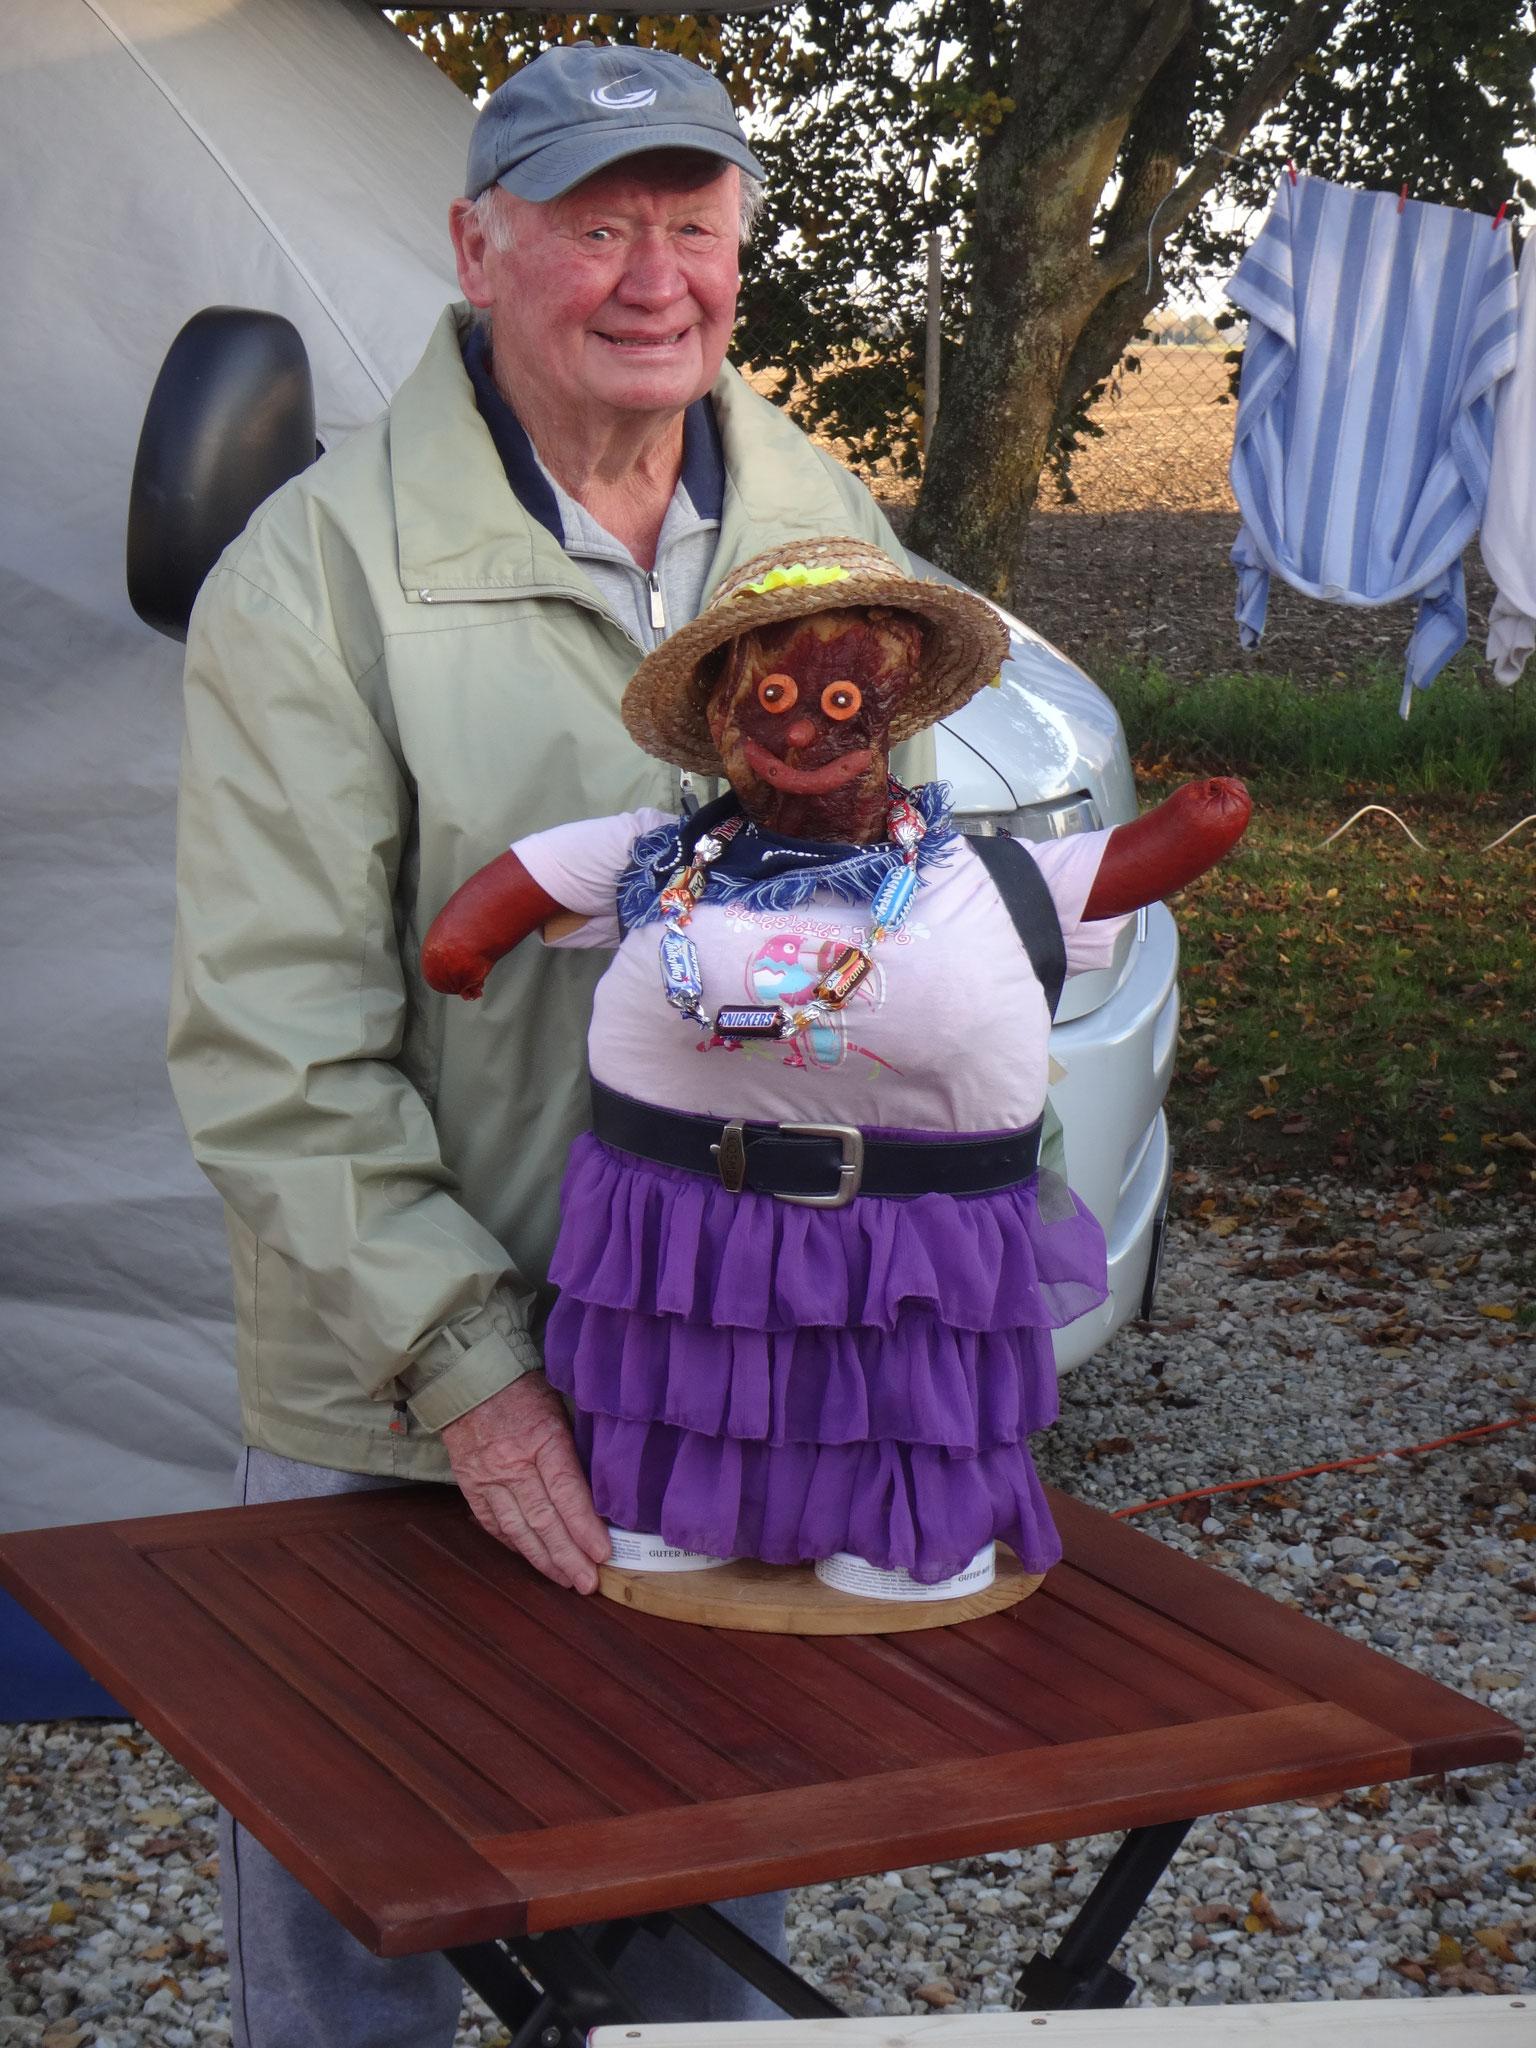 Opas neue Freundin